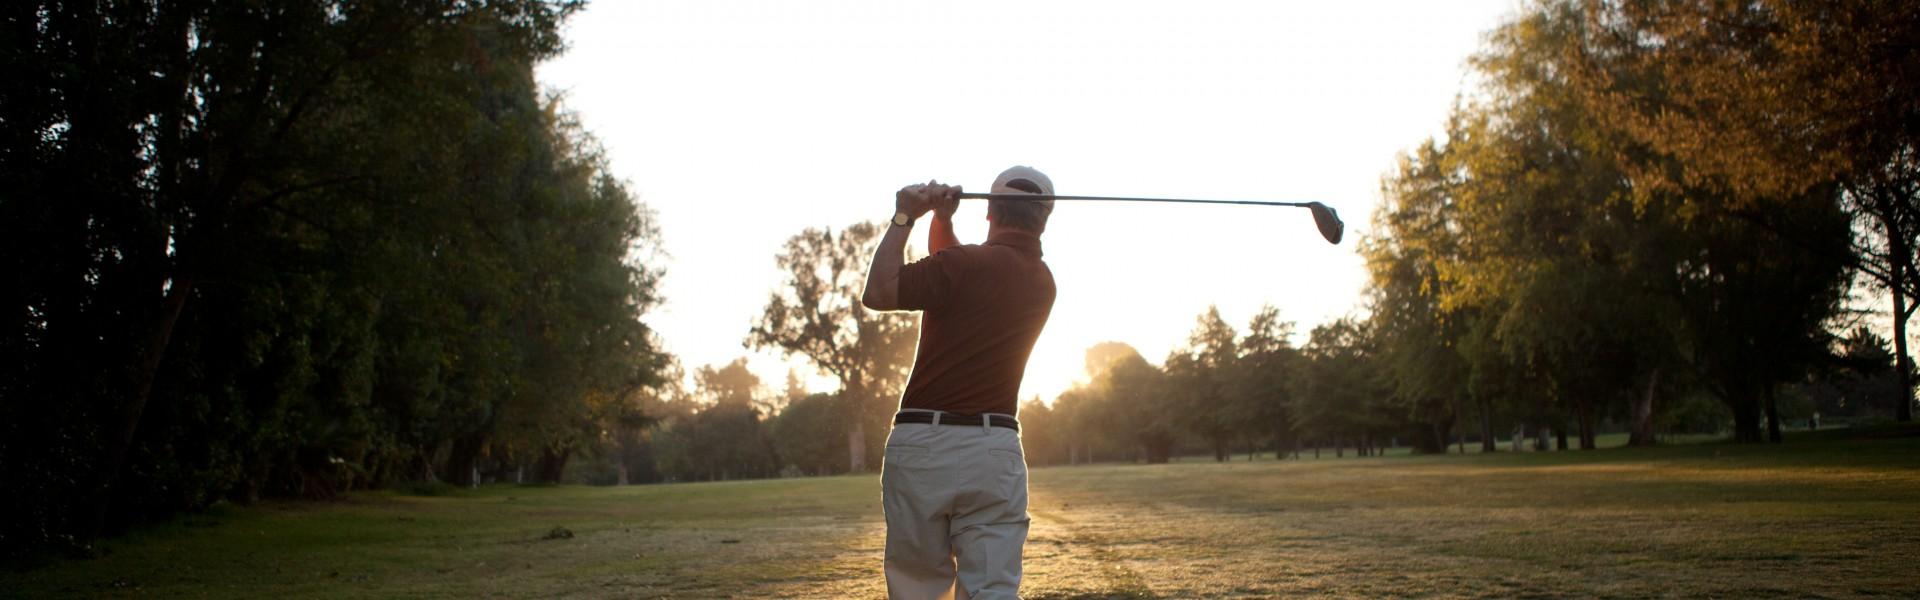 Golfing near Claremont CA